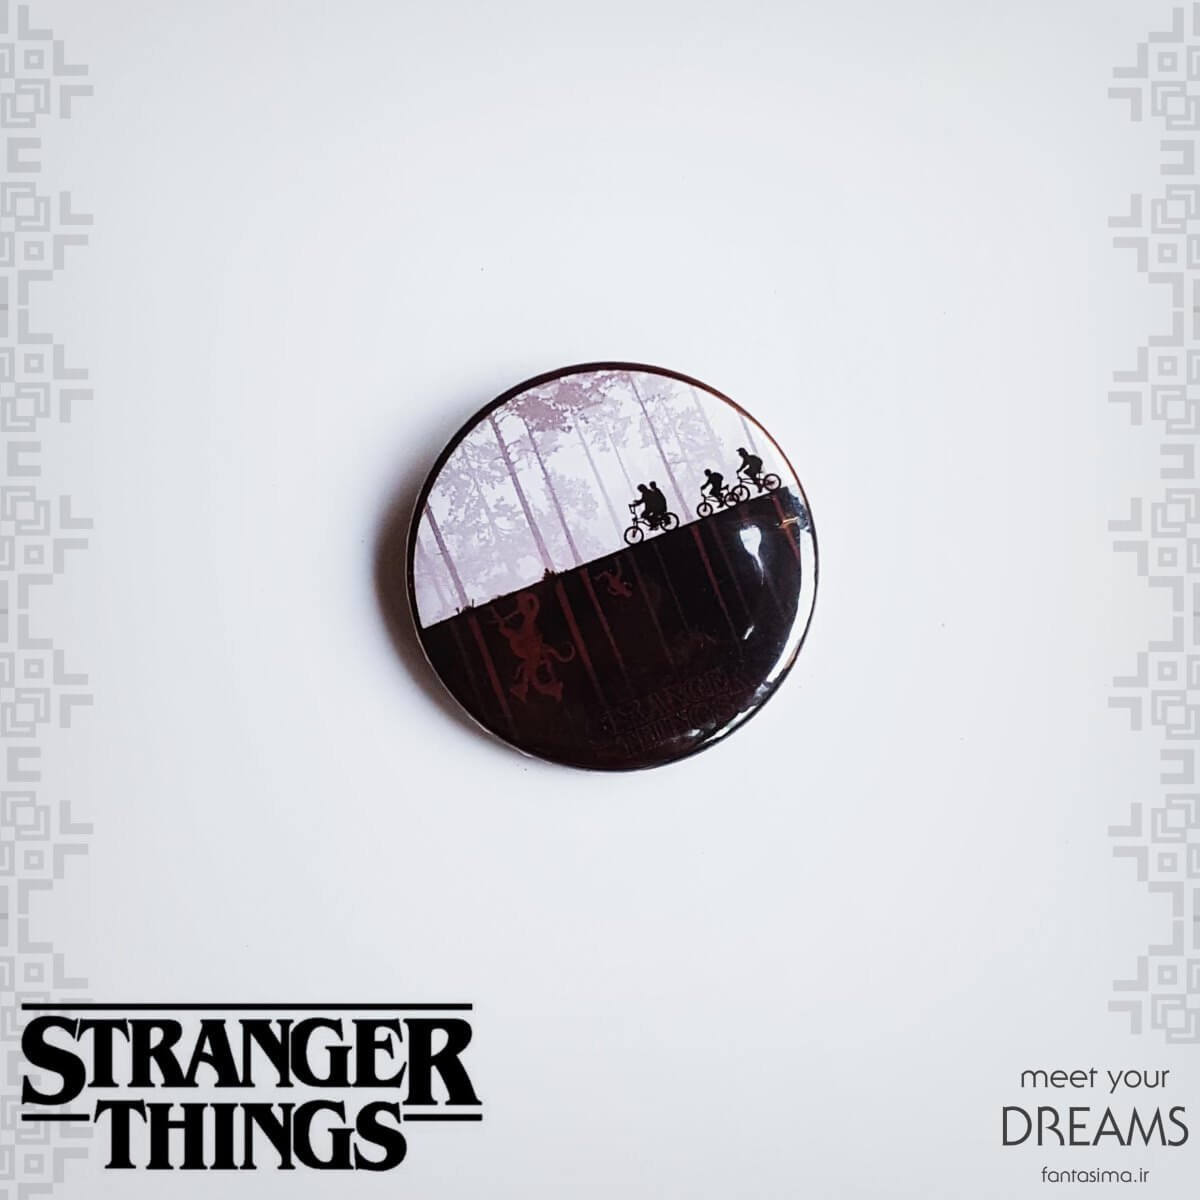 پیکسل فلزی stranger things